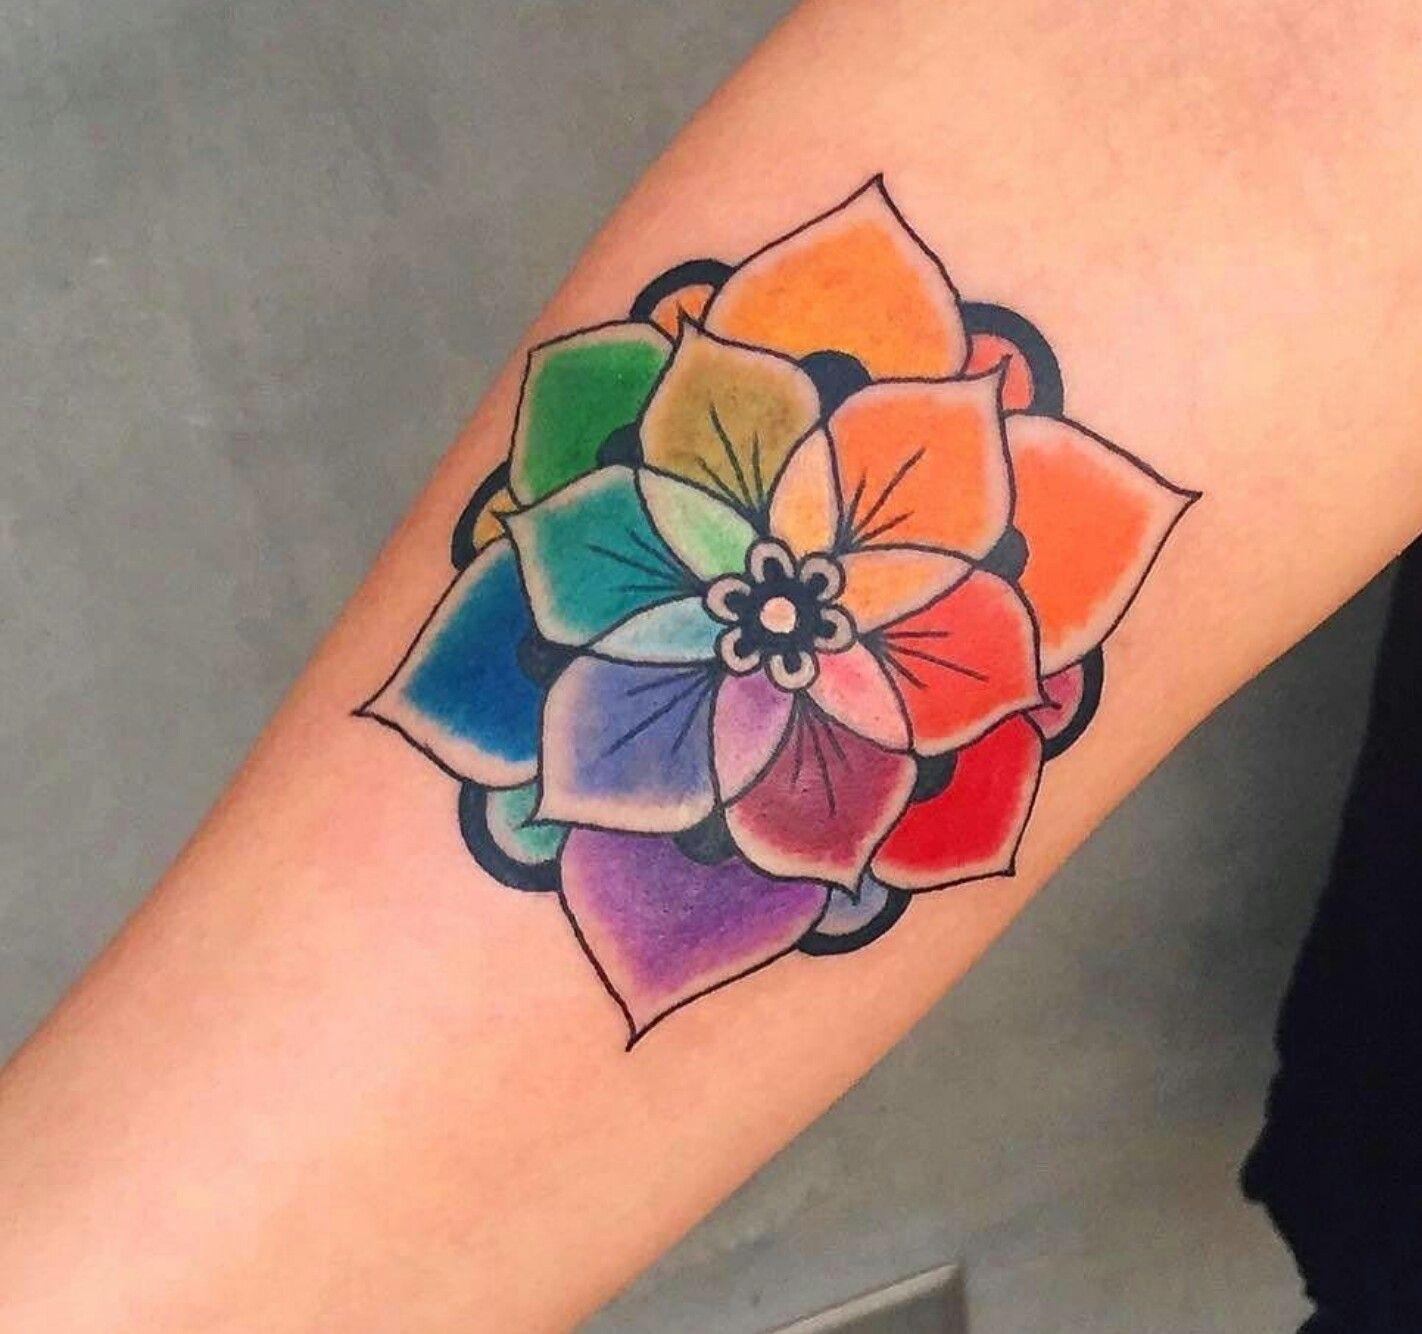 HairColor wheel tattoo tattoos Pinterest Hair color